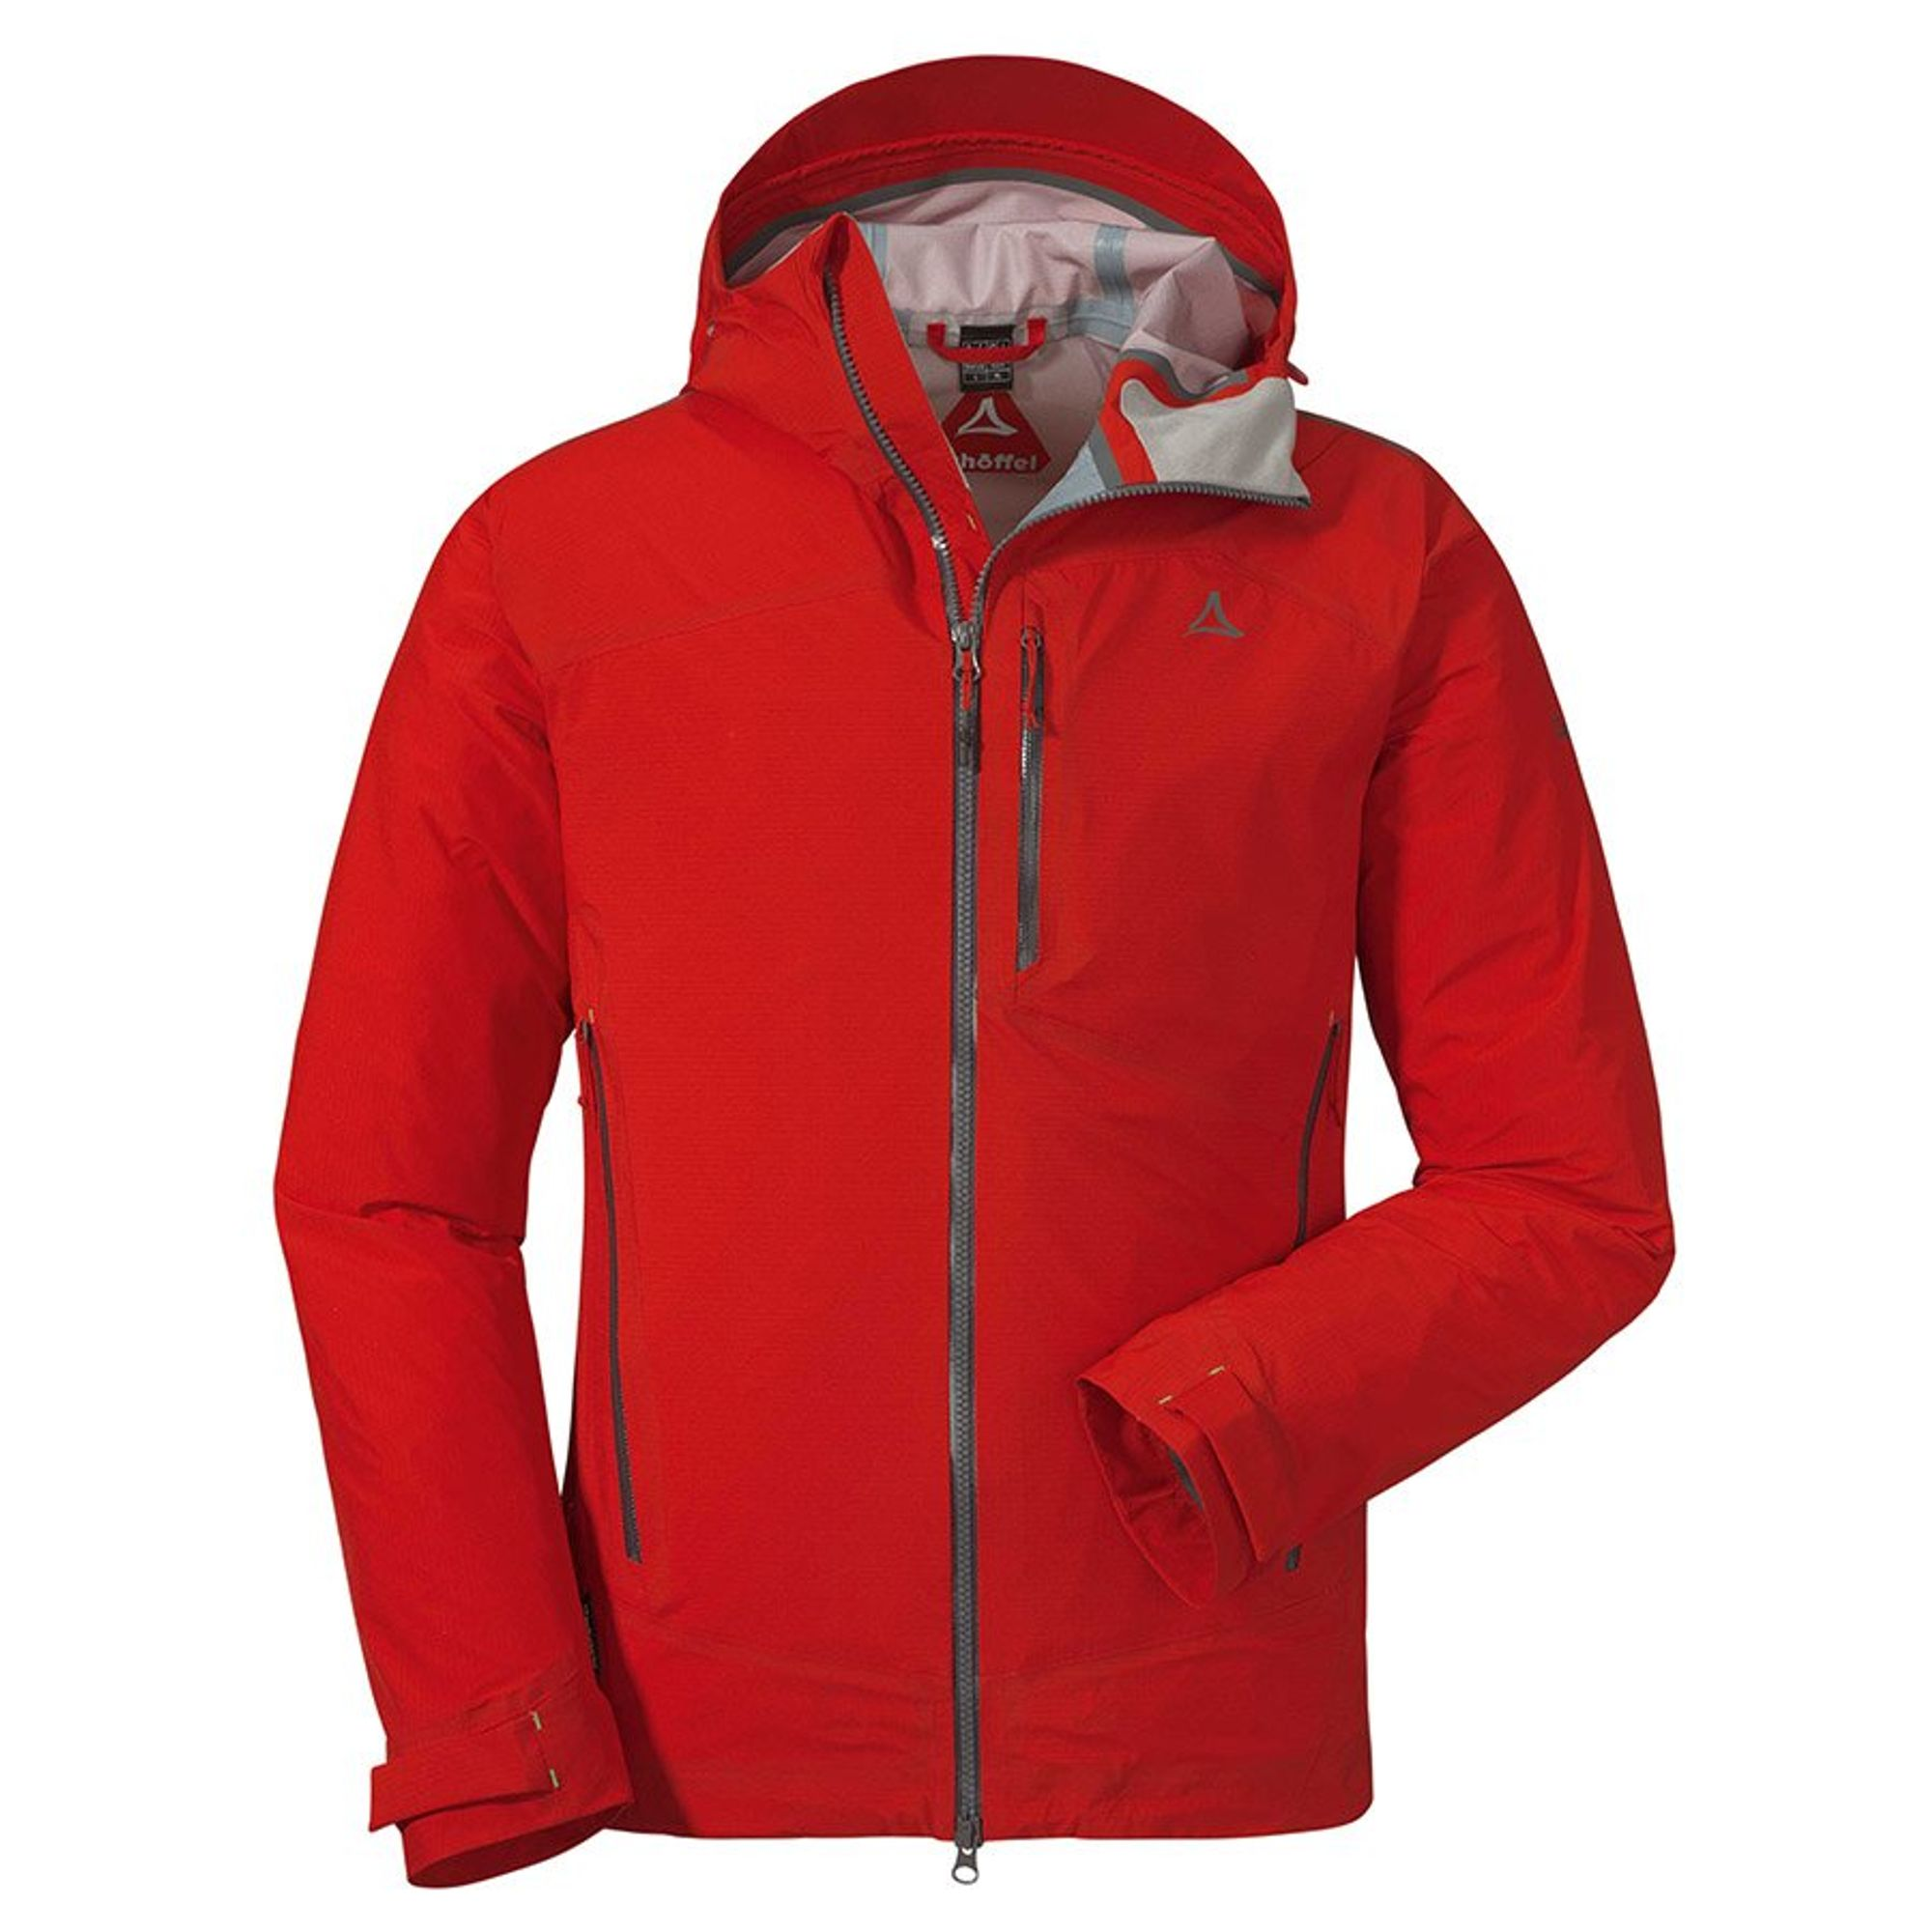 Schöffel 3L Jacket Falun1 (F)/Calgary1 (M)